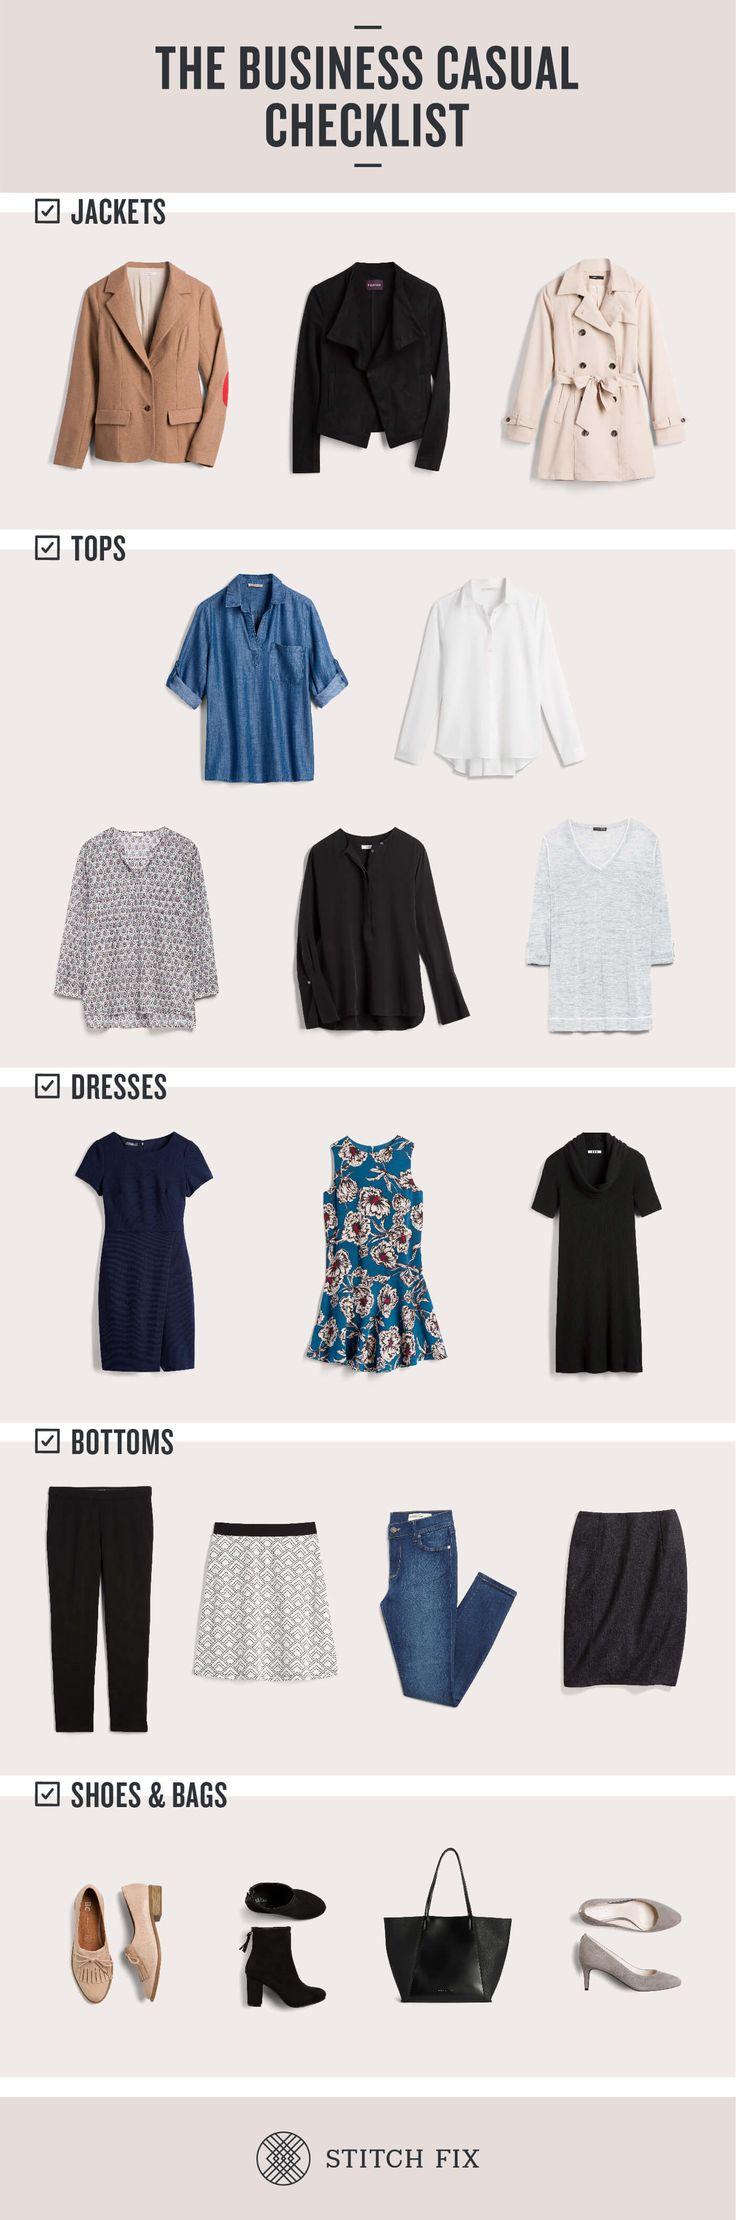 The Business Casual Wardrobe Checklist | Stitch Fix Style